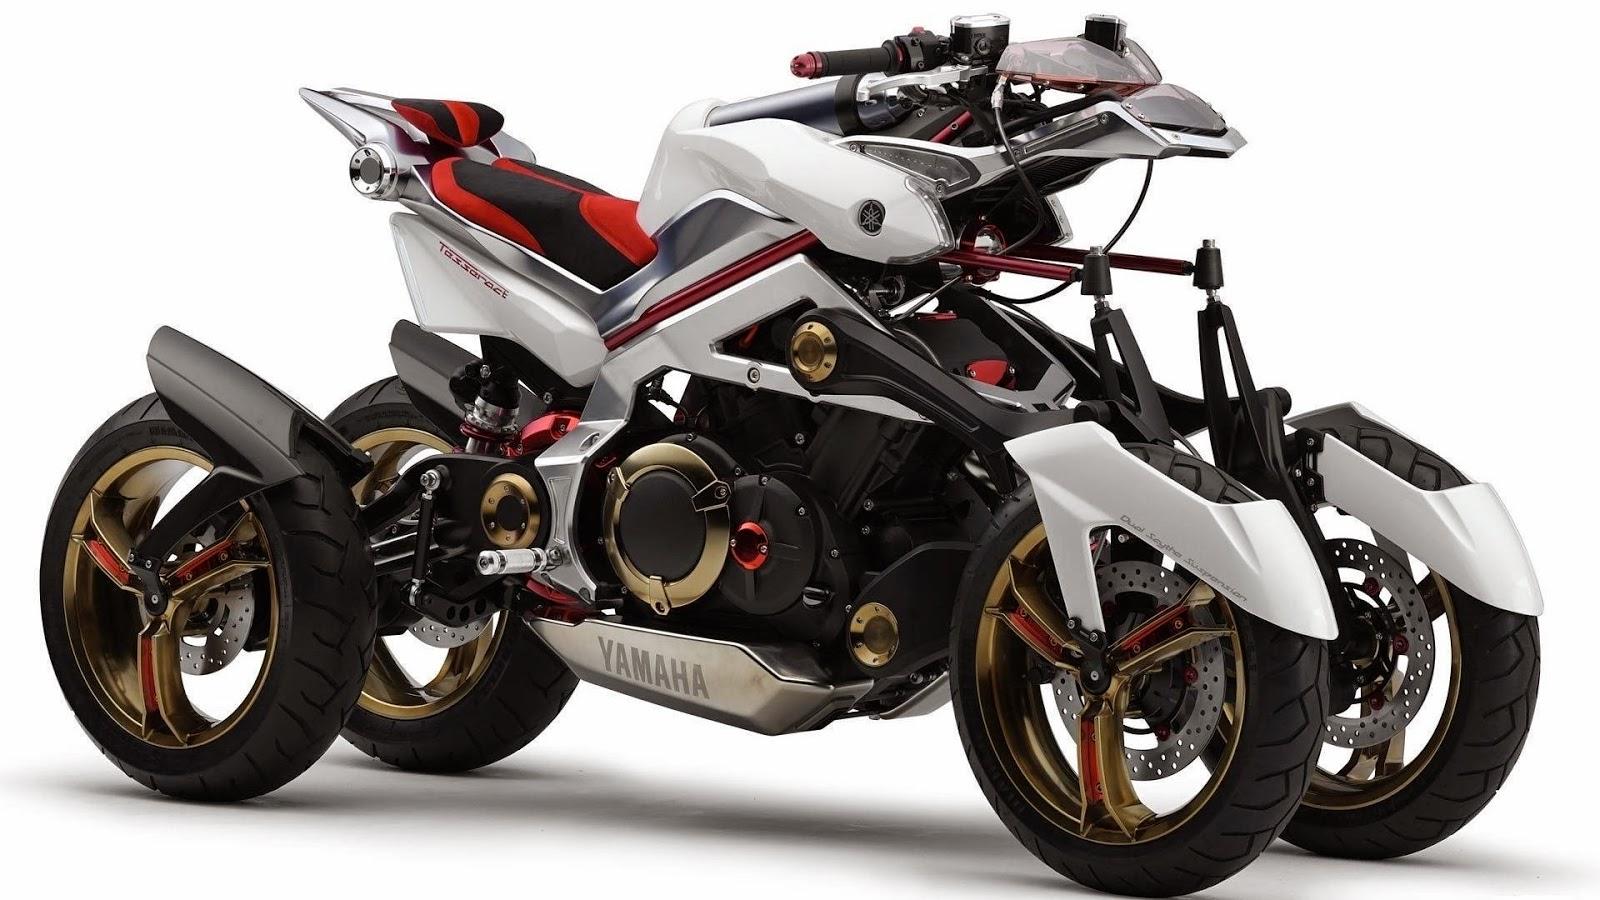 Motocicleta Yamaha Tesseract Full HD Wallpaper